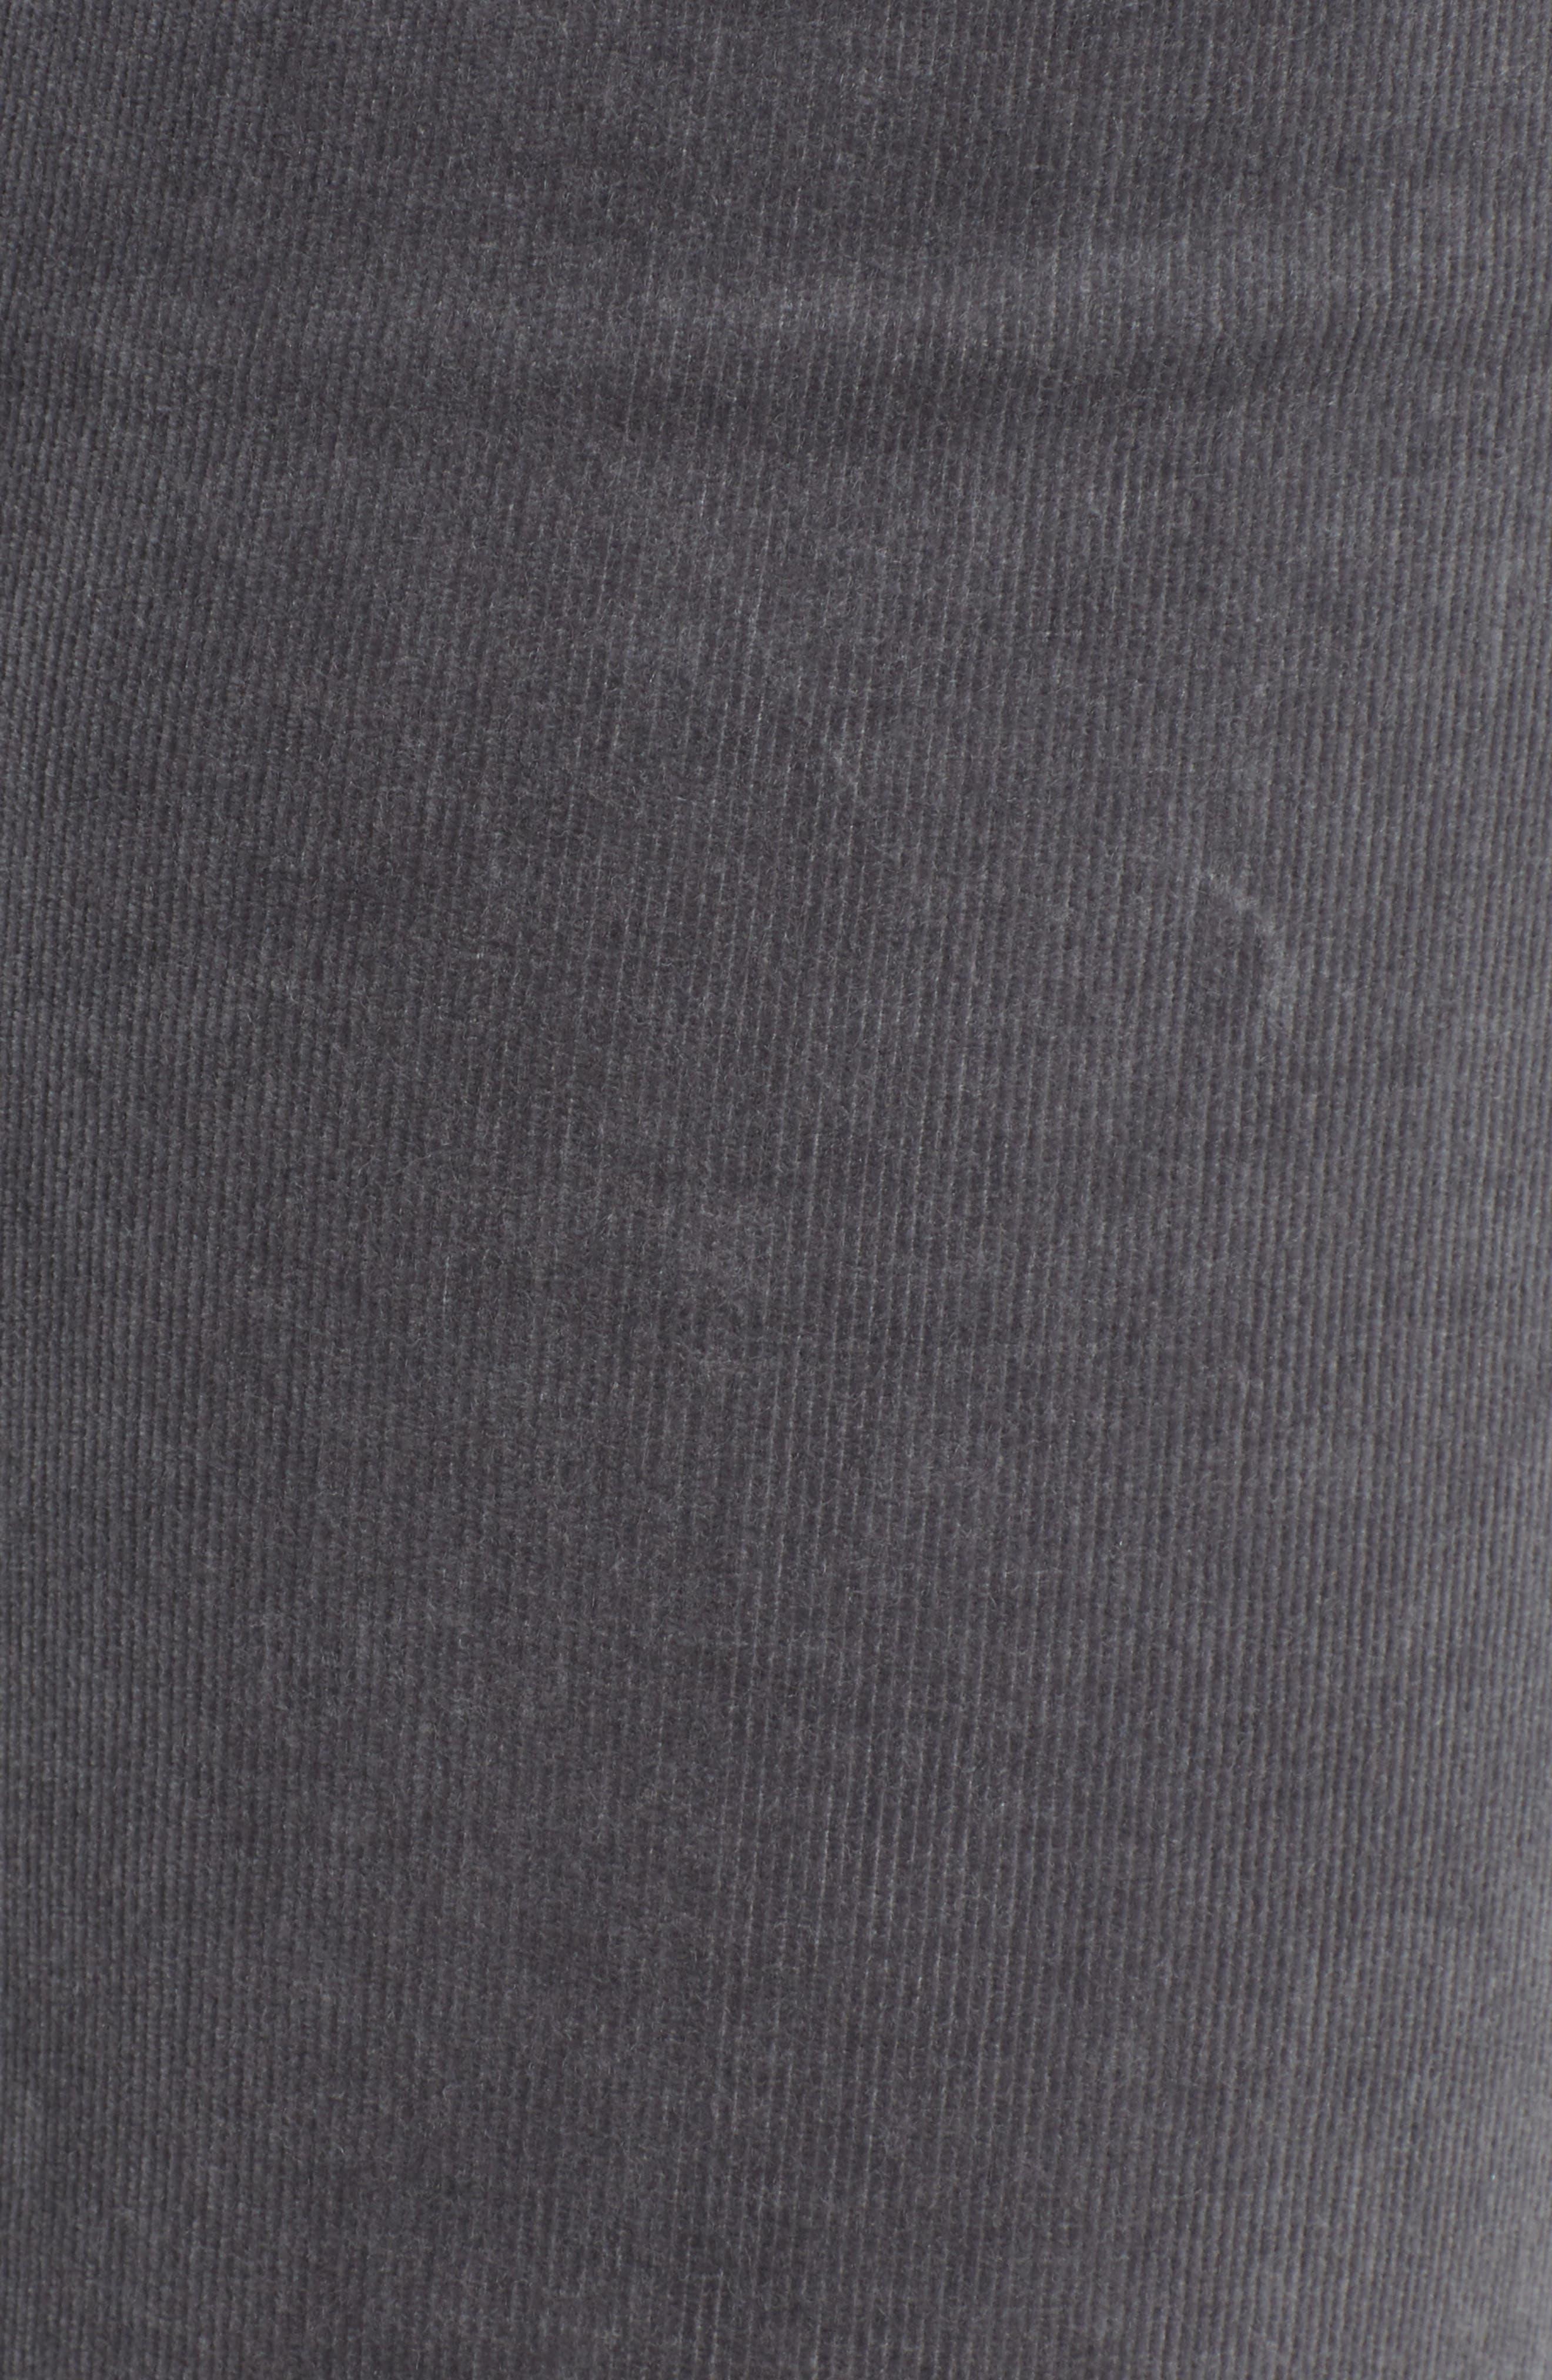 'Diana' Stretch Corduroy Skinny Pants,                             Alternate thumbnail 209, color,